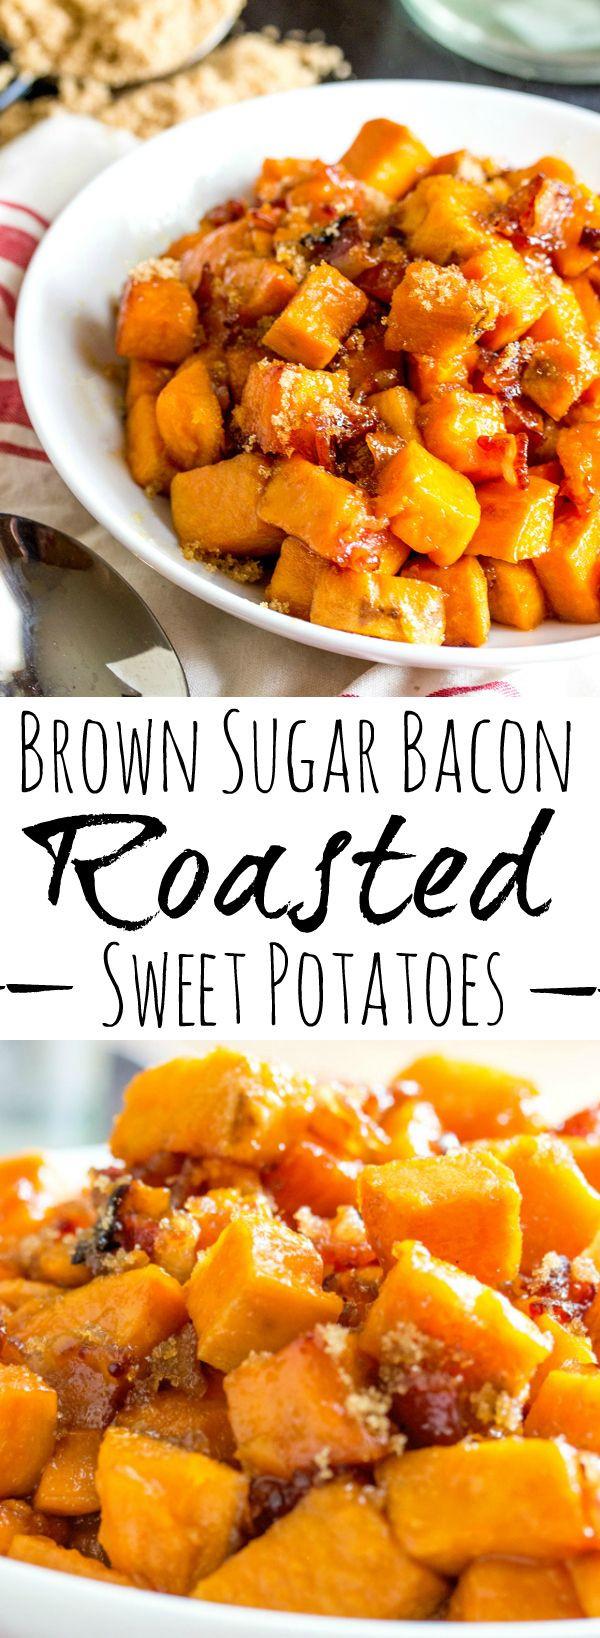 Sweet Potatoes Thanksgiving Side Dishes  17 Best ideas about Sweet Potato Casserole on Pinterest